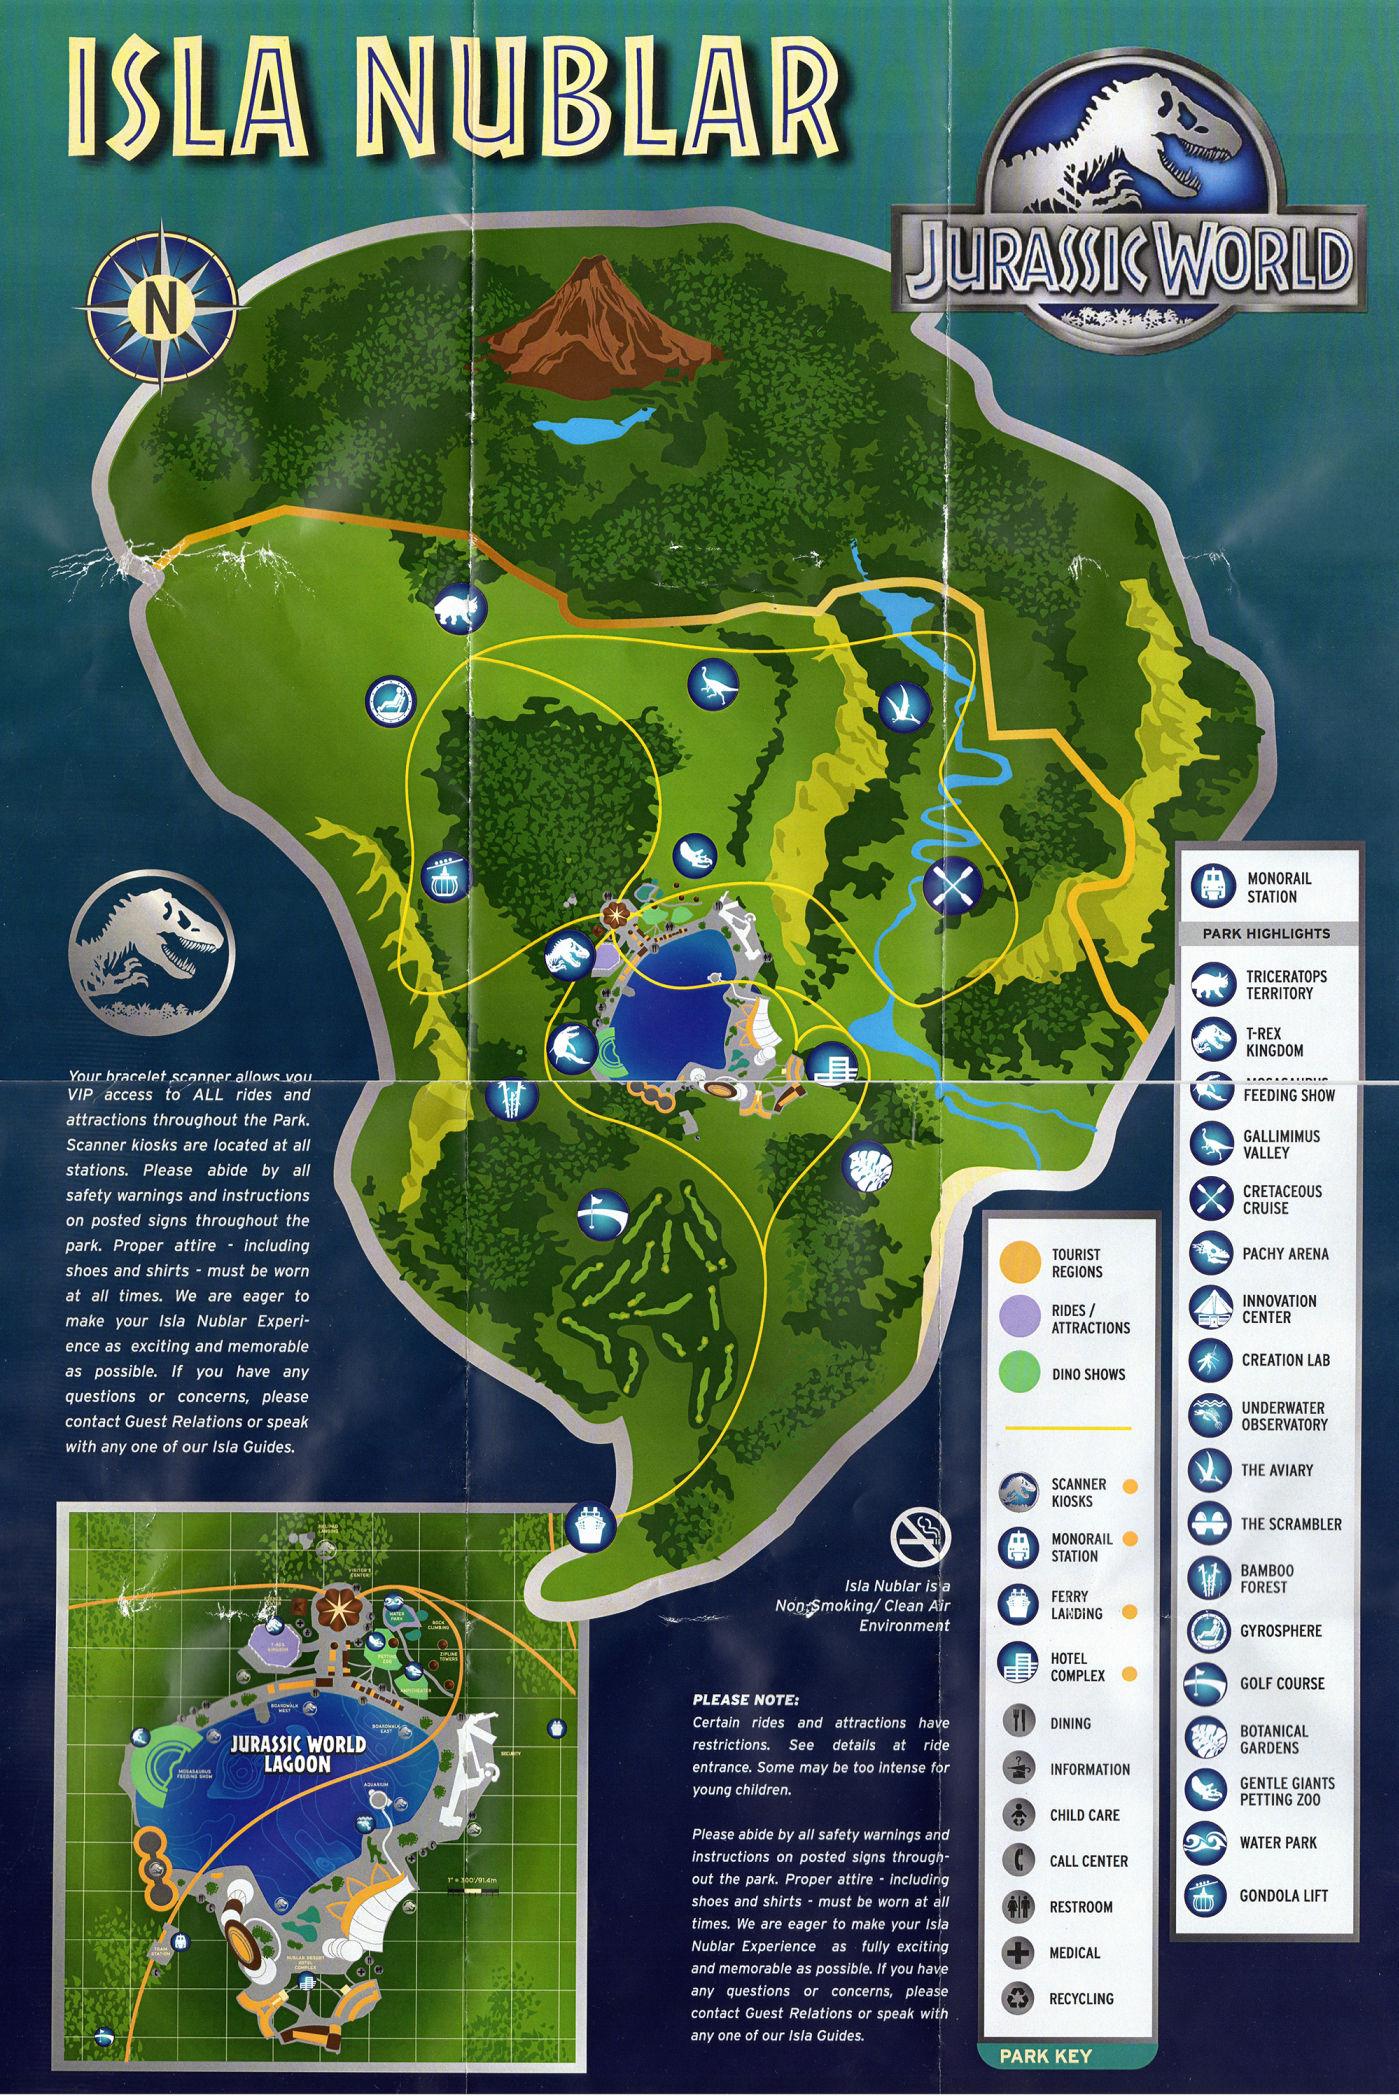 Jurassic World Map Image   Jurassic World Map Full. | Jurassic Park wiki | FANDOM  Jurassic World Map